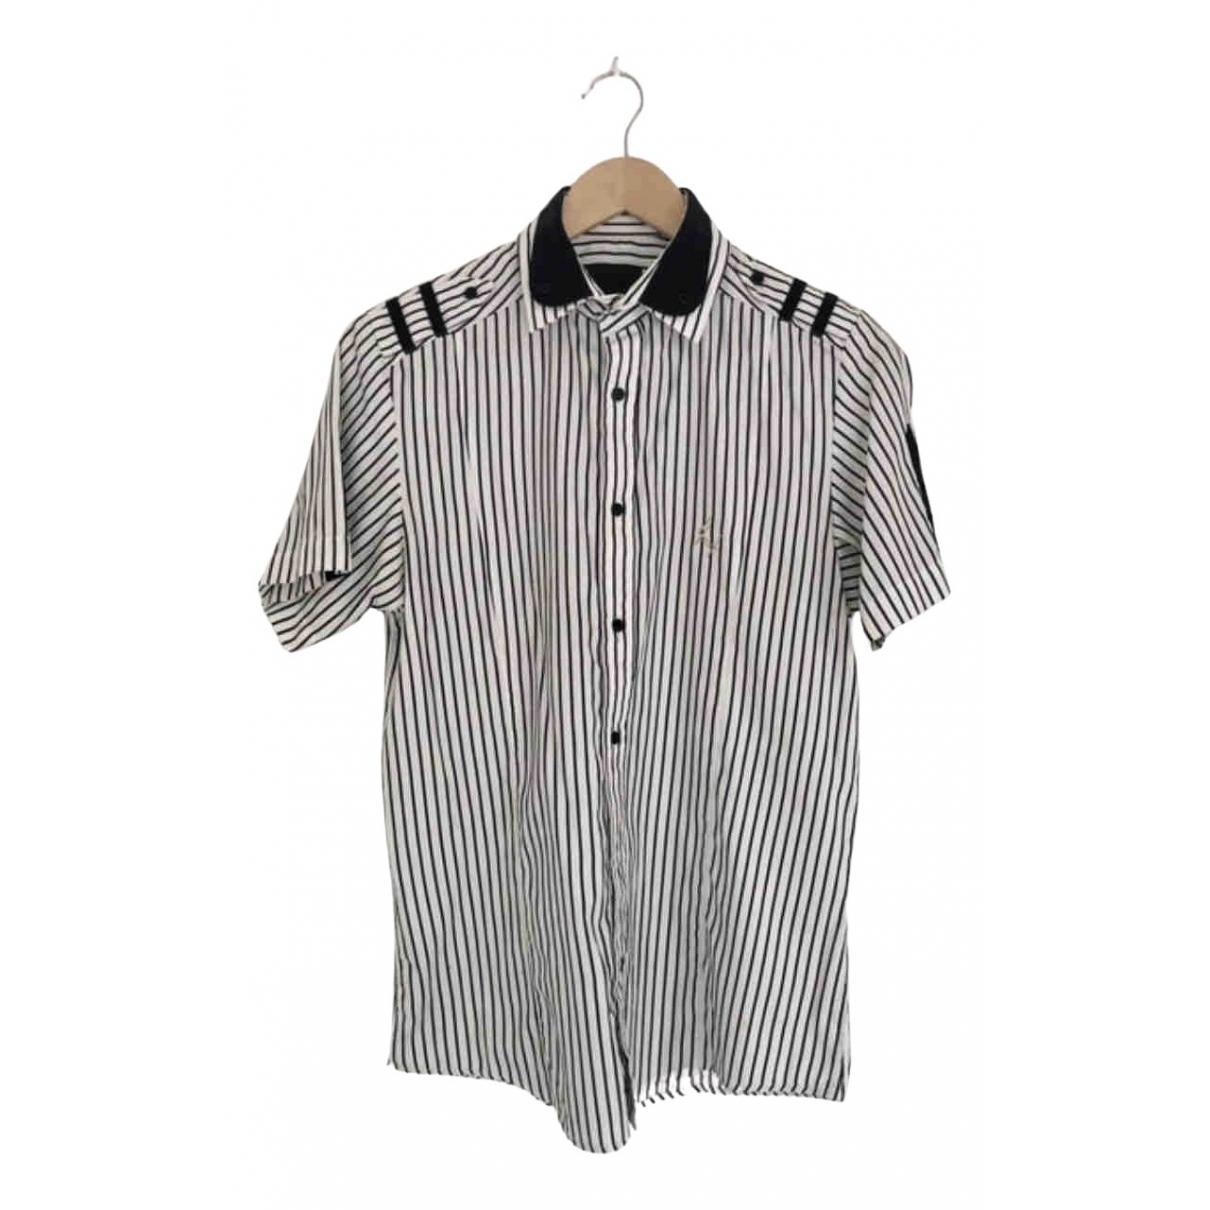 Les Hommes \N White Cotton Shirts for Men M International